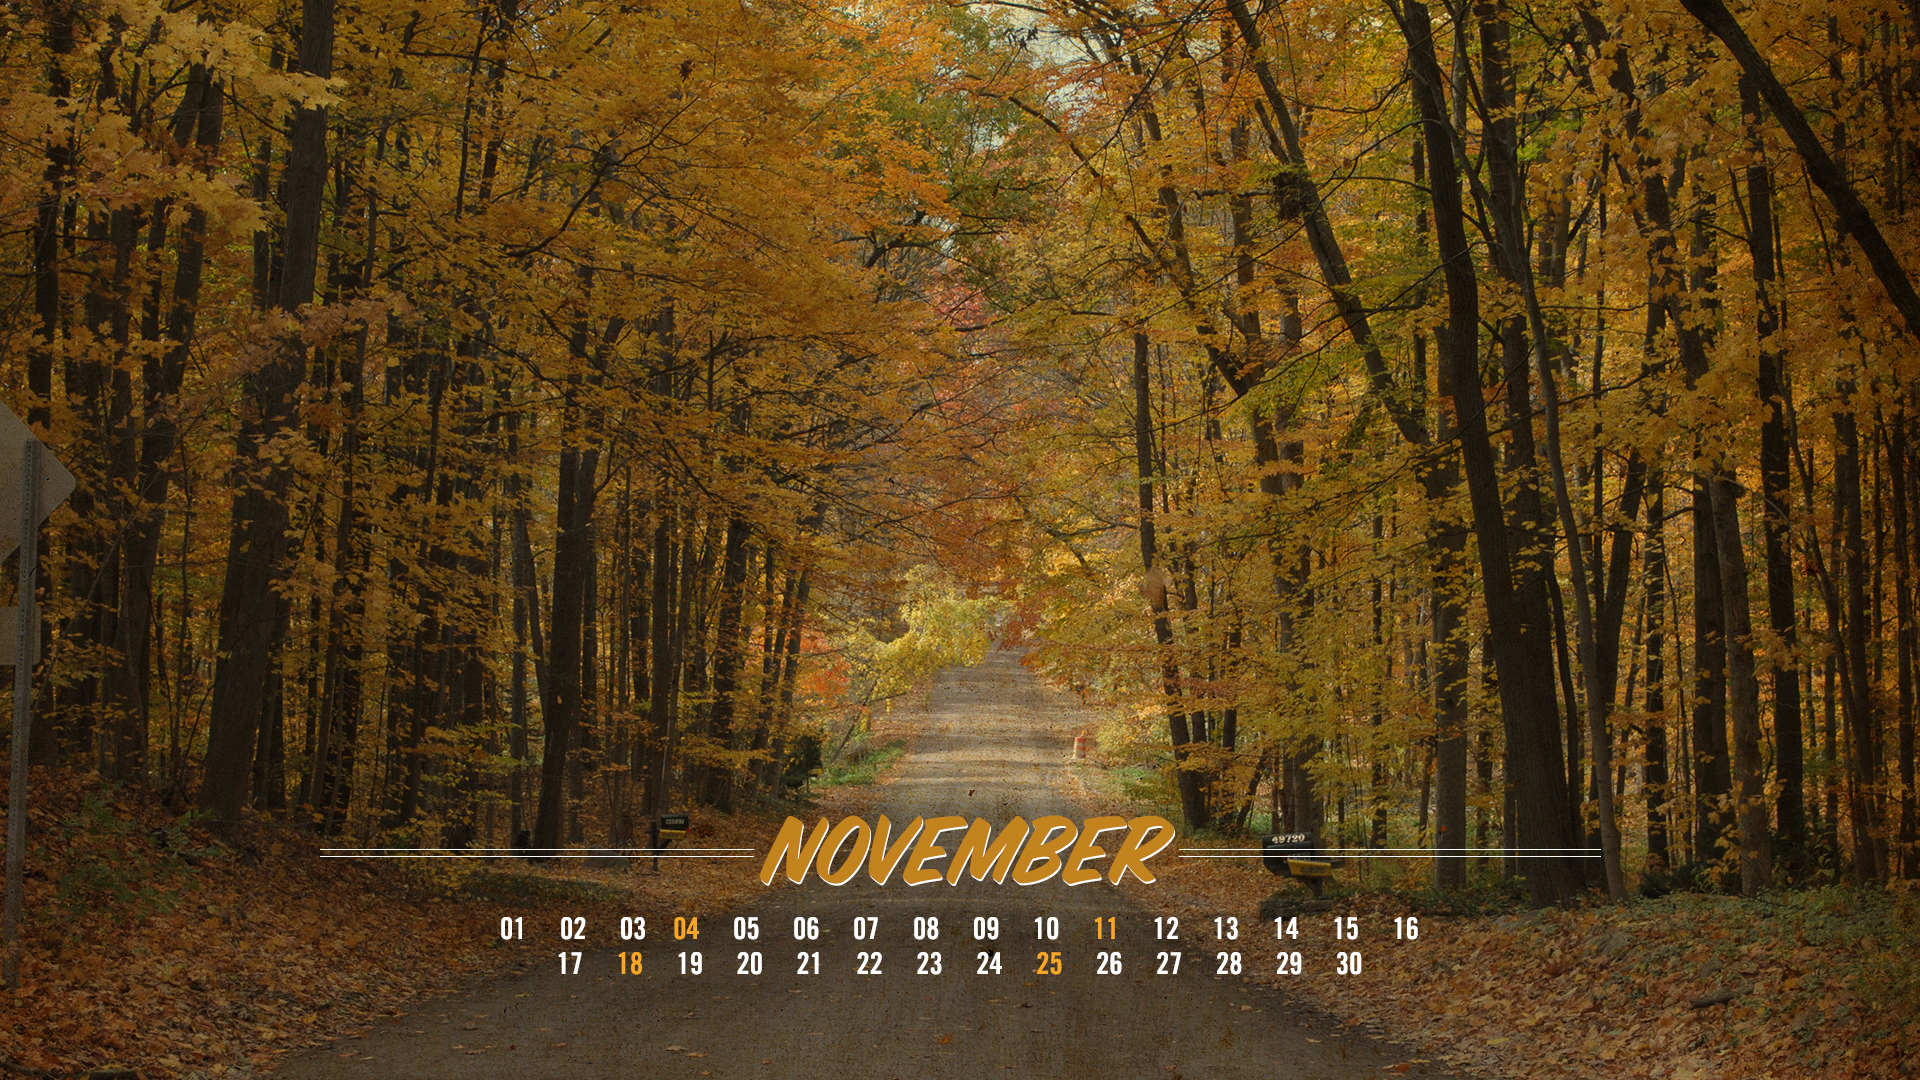 Free Fall Screensavers And Wallpaper November Wallpapers Hd Free Download Pixelstalk Net